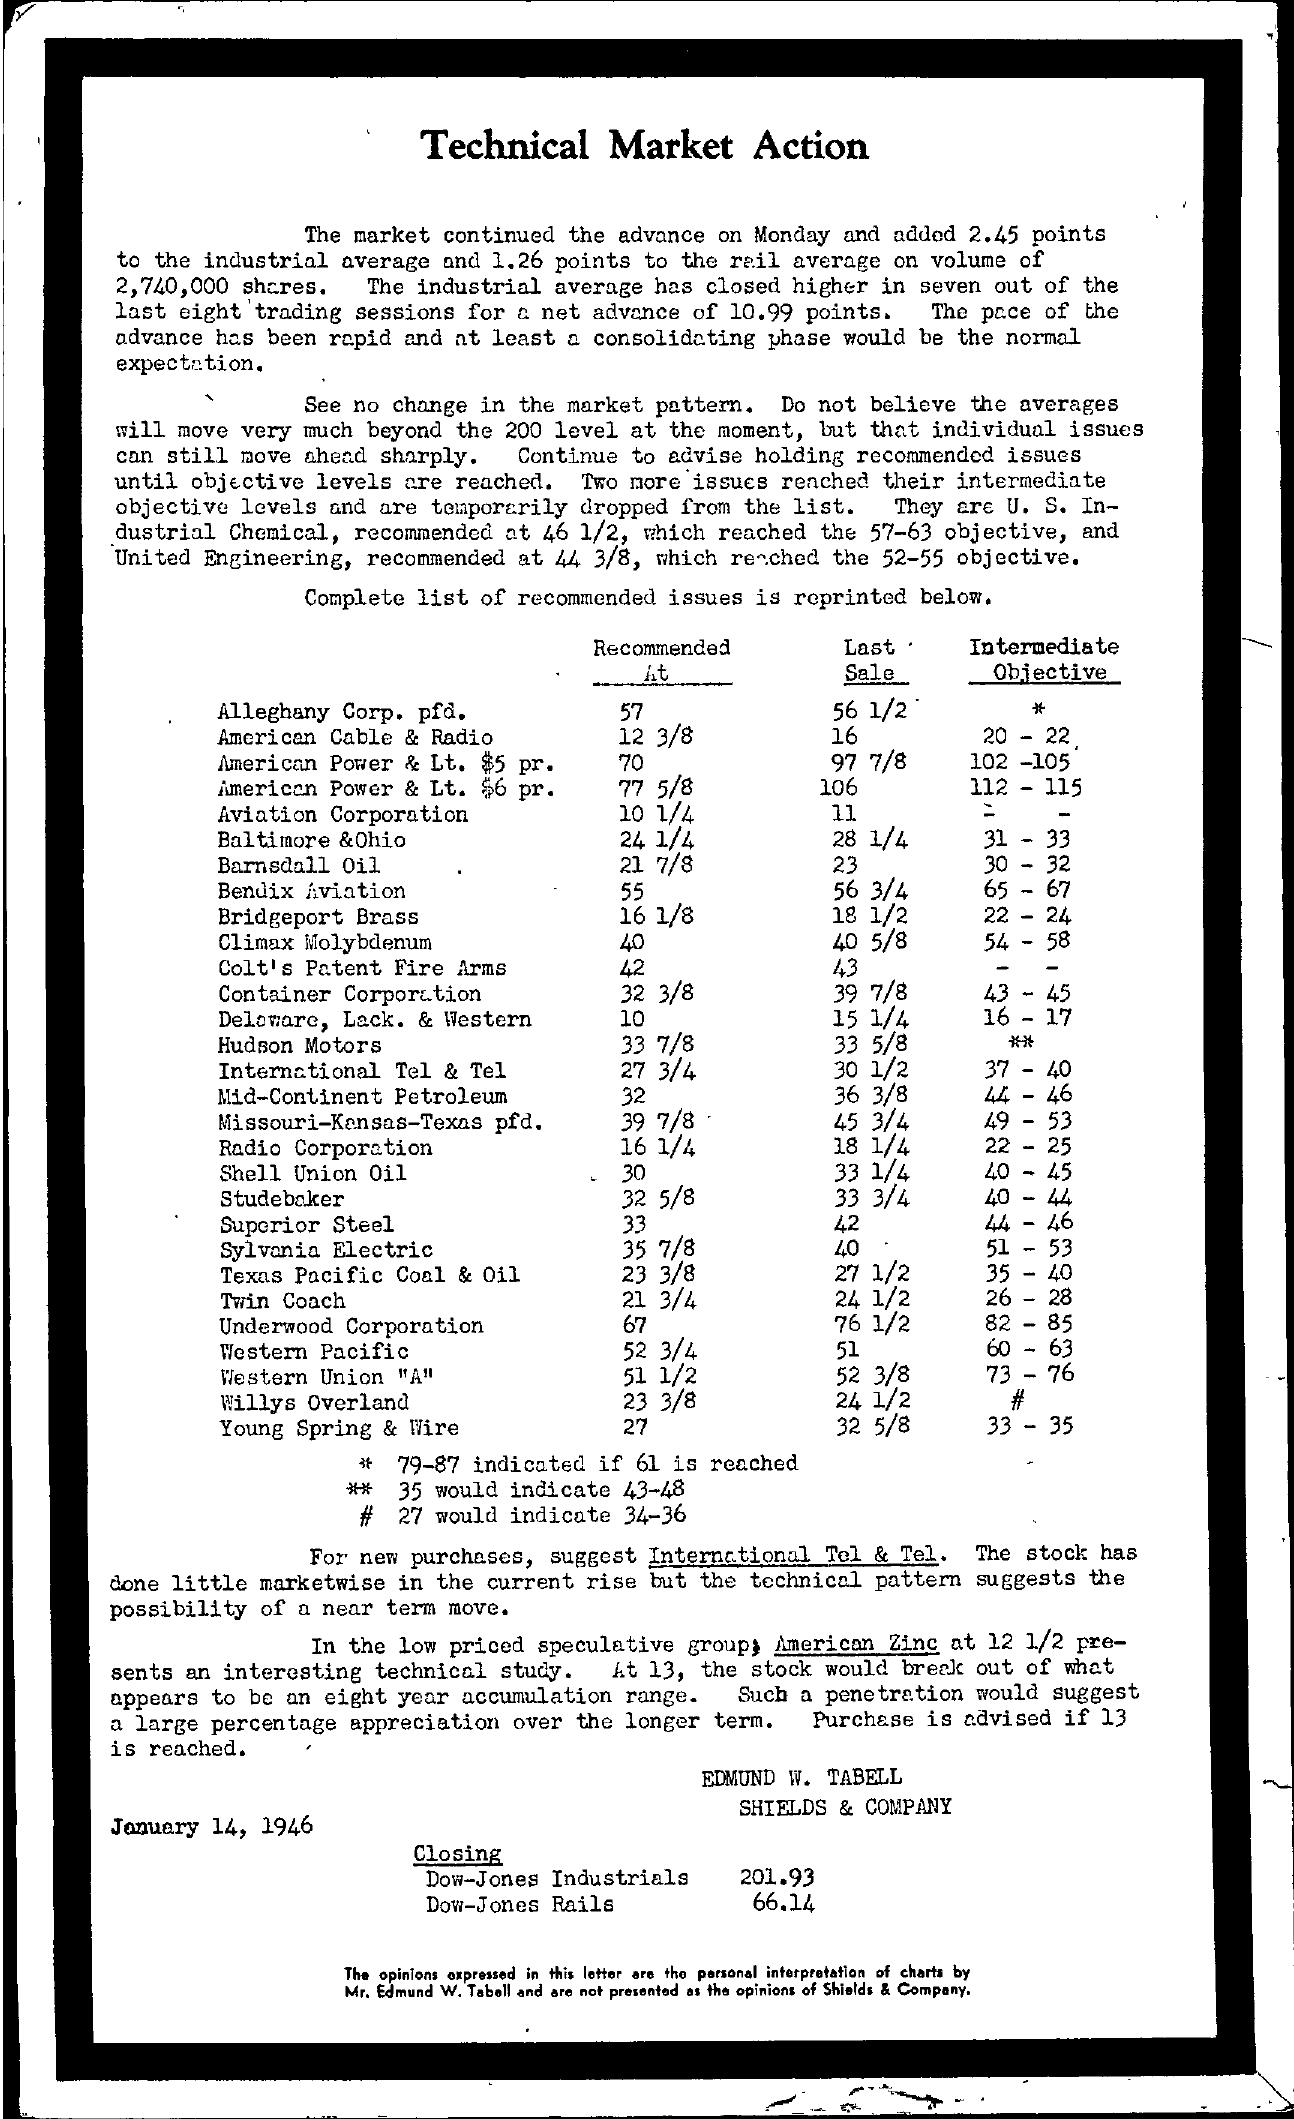 Tabell's Market Letter - January 14, 1946